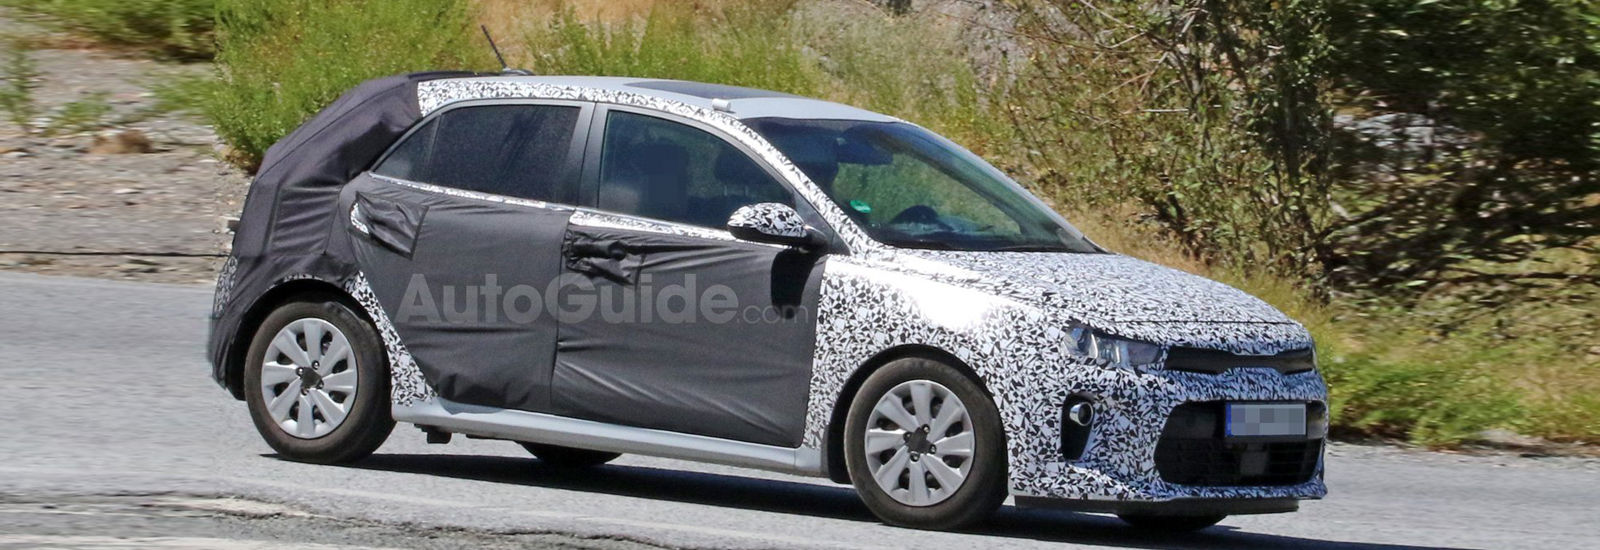 2018 Kia Rio Gt Hot Hatch Price Specs Release Date Carwow